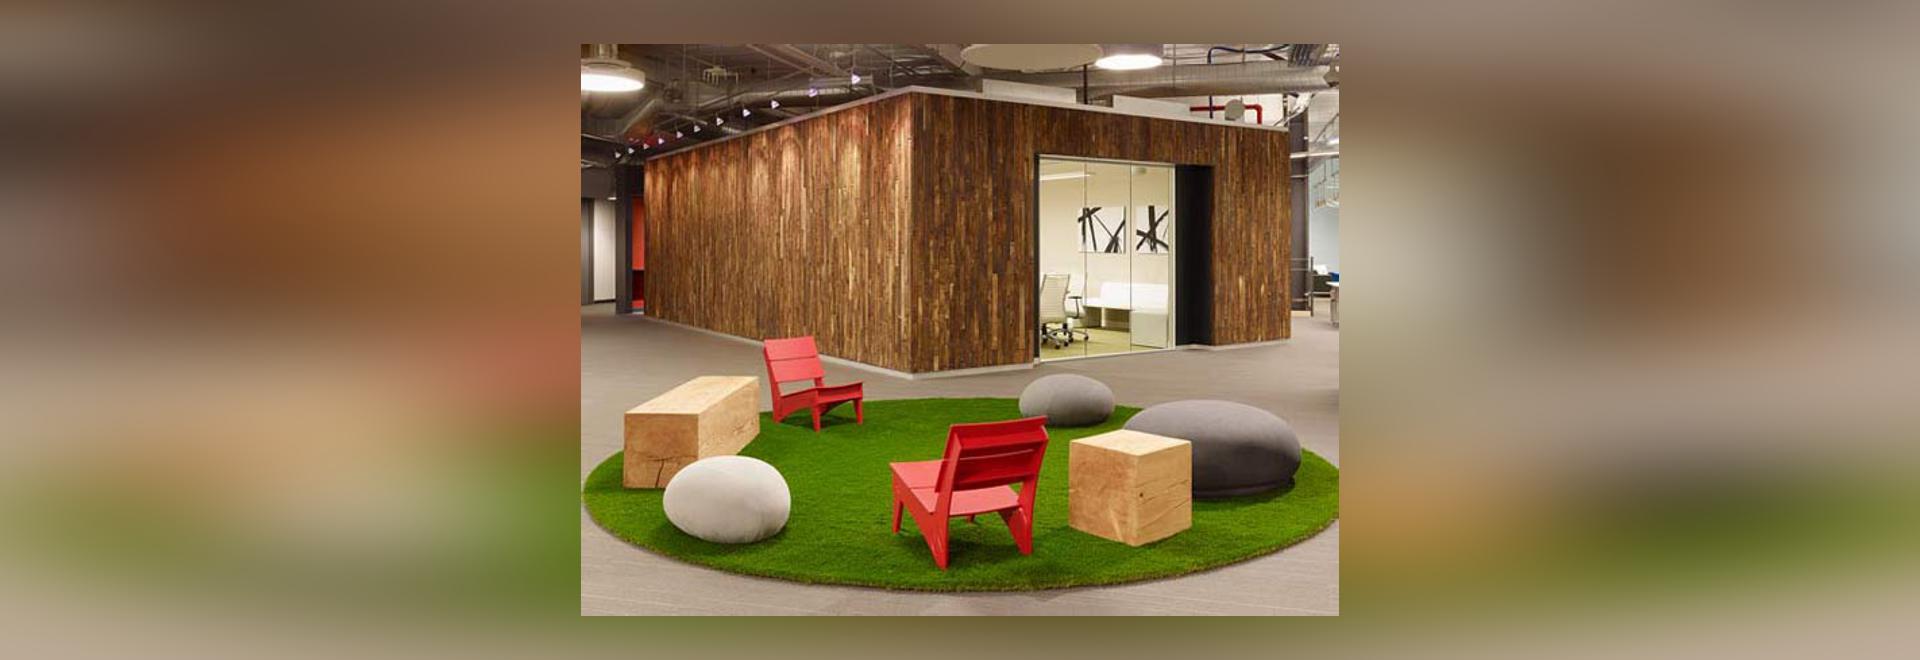 Skype HQ By Design Blitz